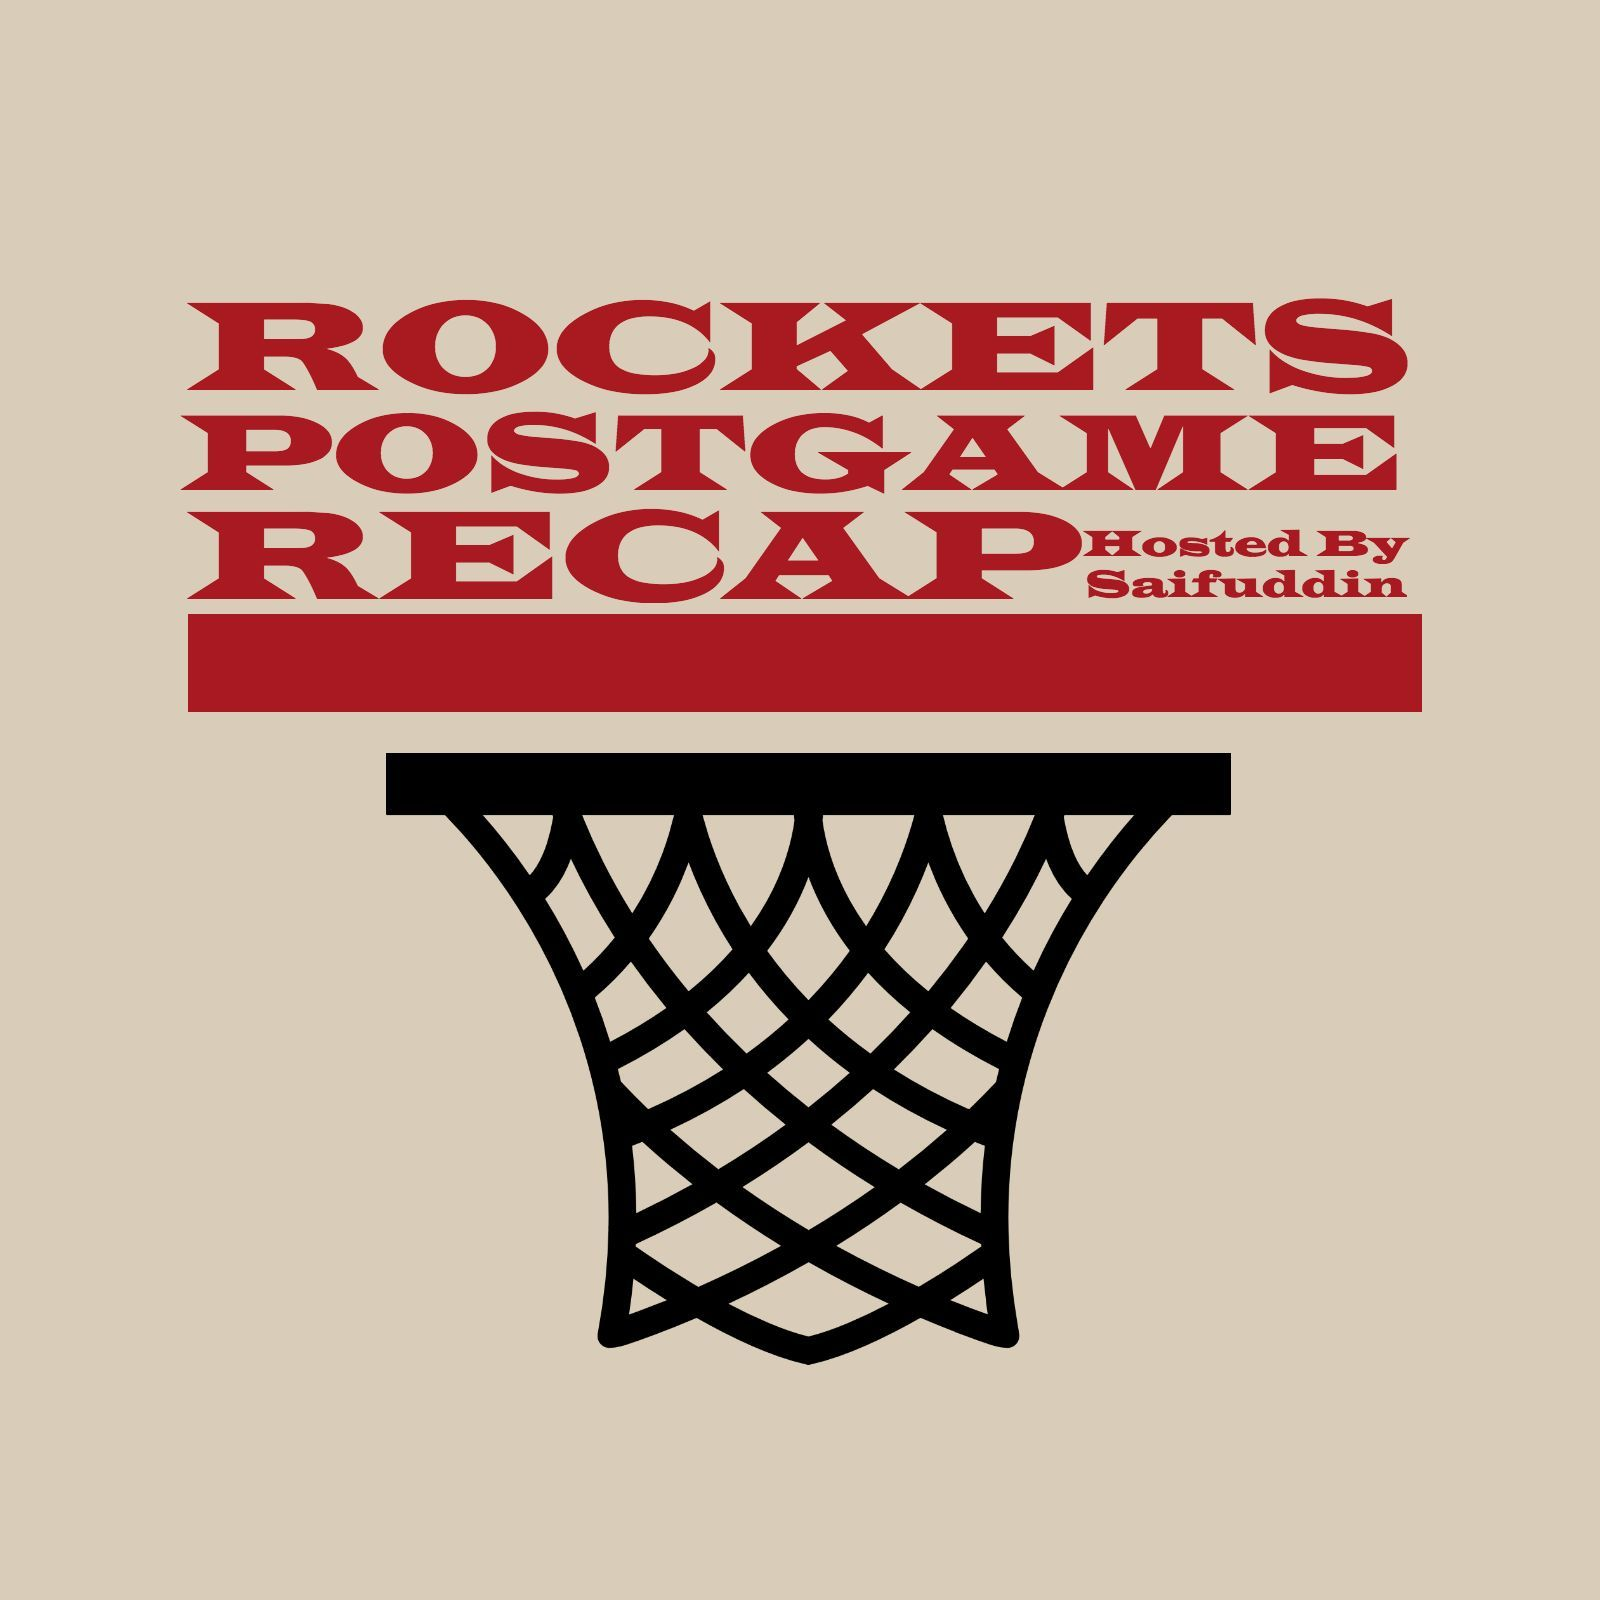 April 7 - Missed Chance Vs Mavericks